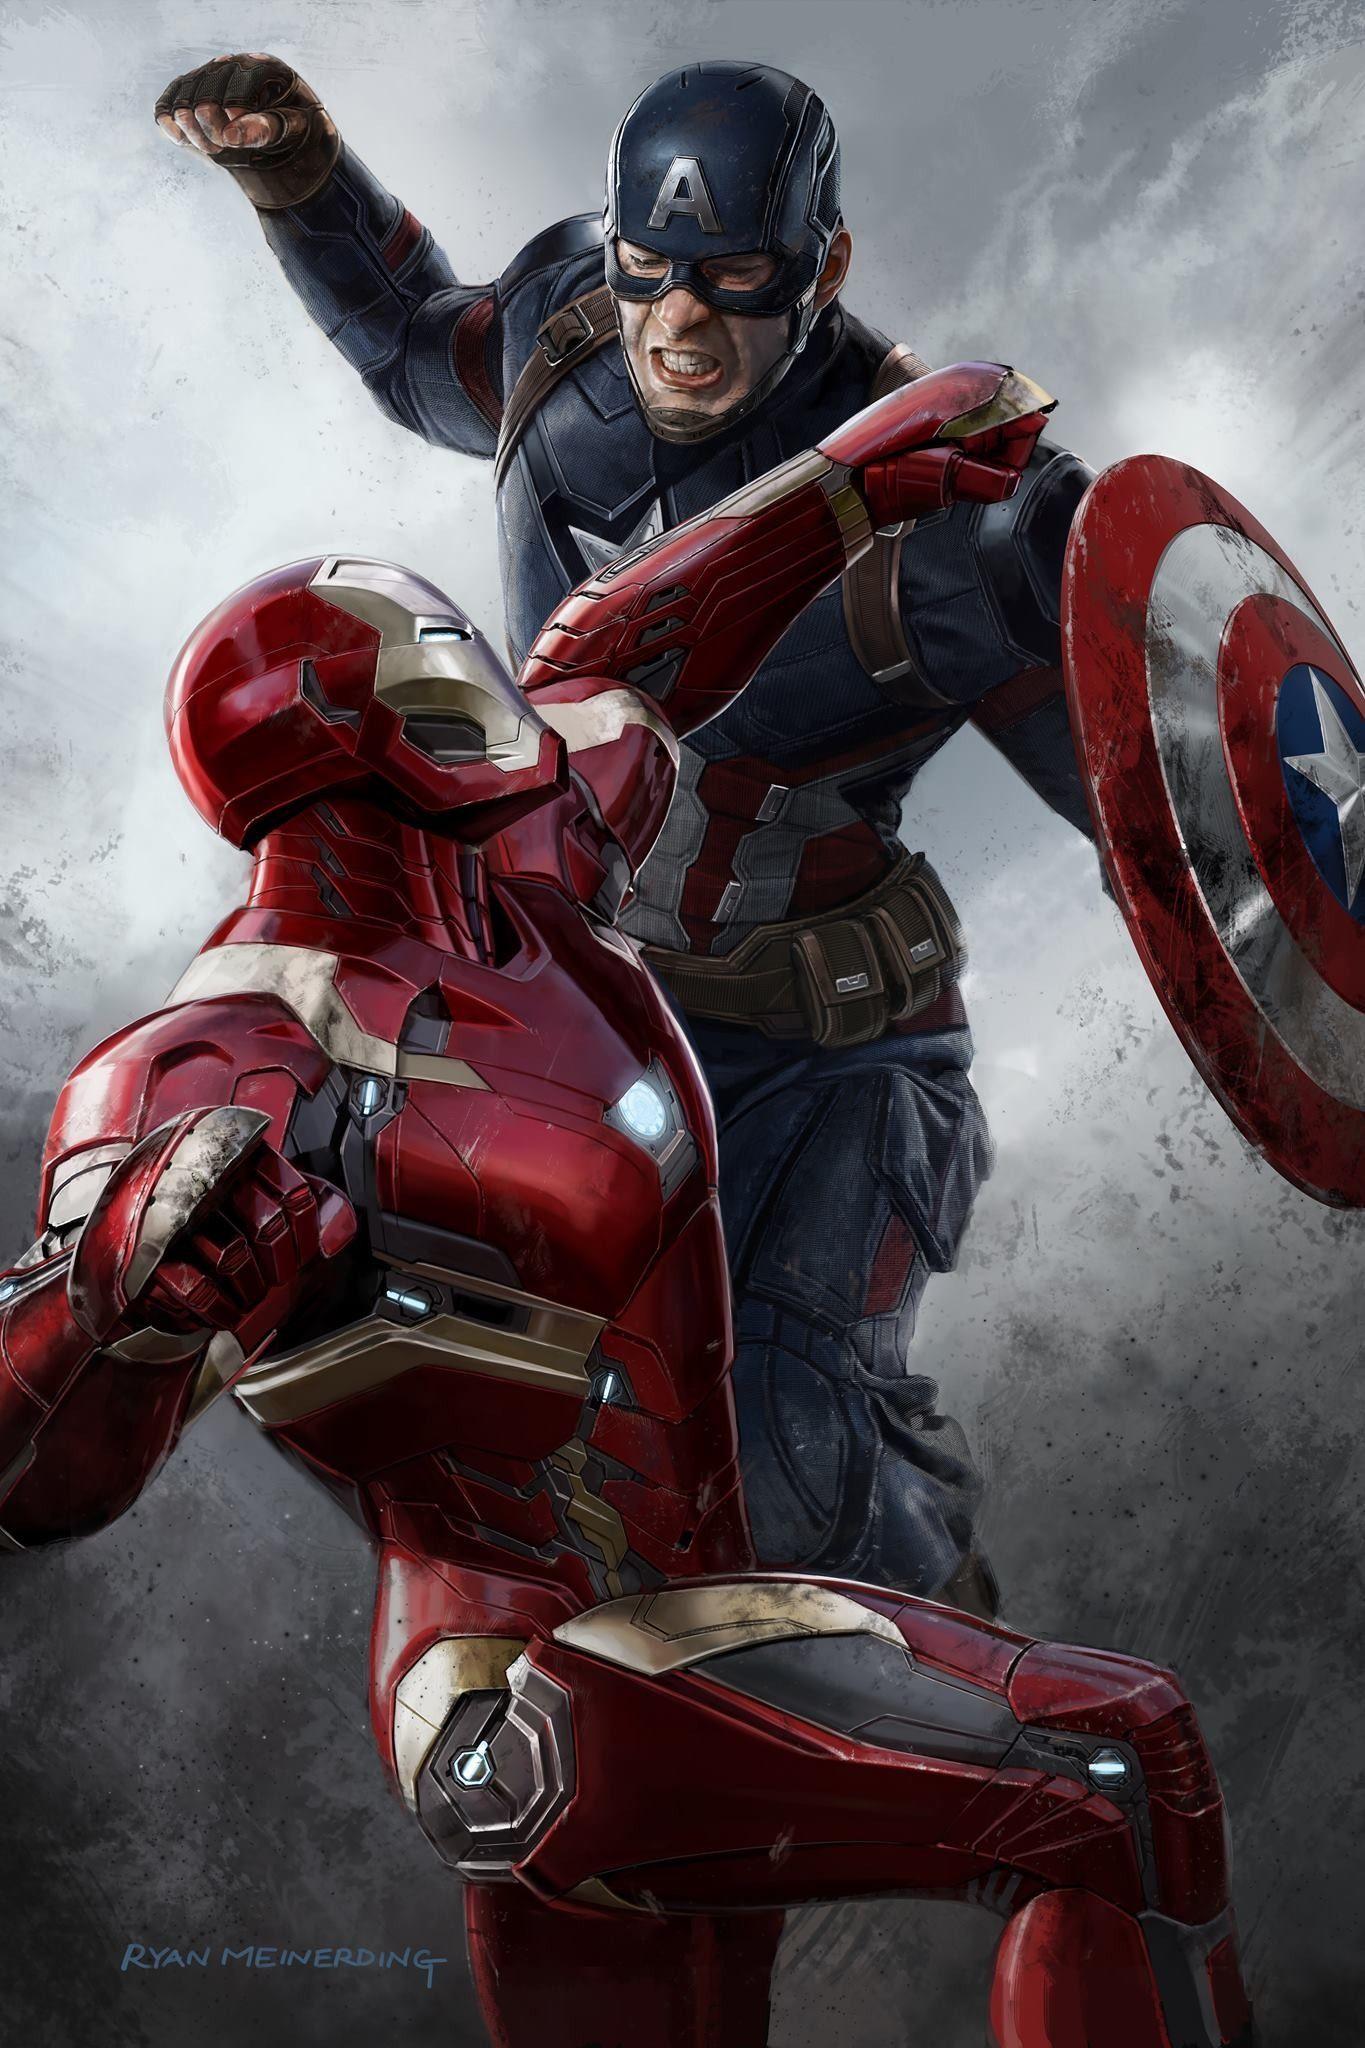 Civil War Wallpapers Fondos De Pantalla Marvel 4k Y Hd Para Celul Iron Man Vs Captain America Marvel Captain America Civil War Captain America Civil War Poster